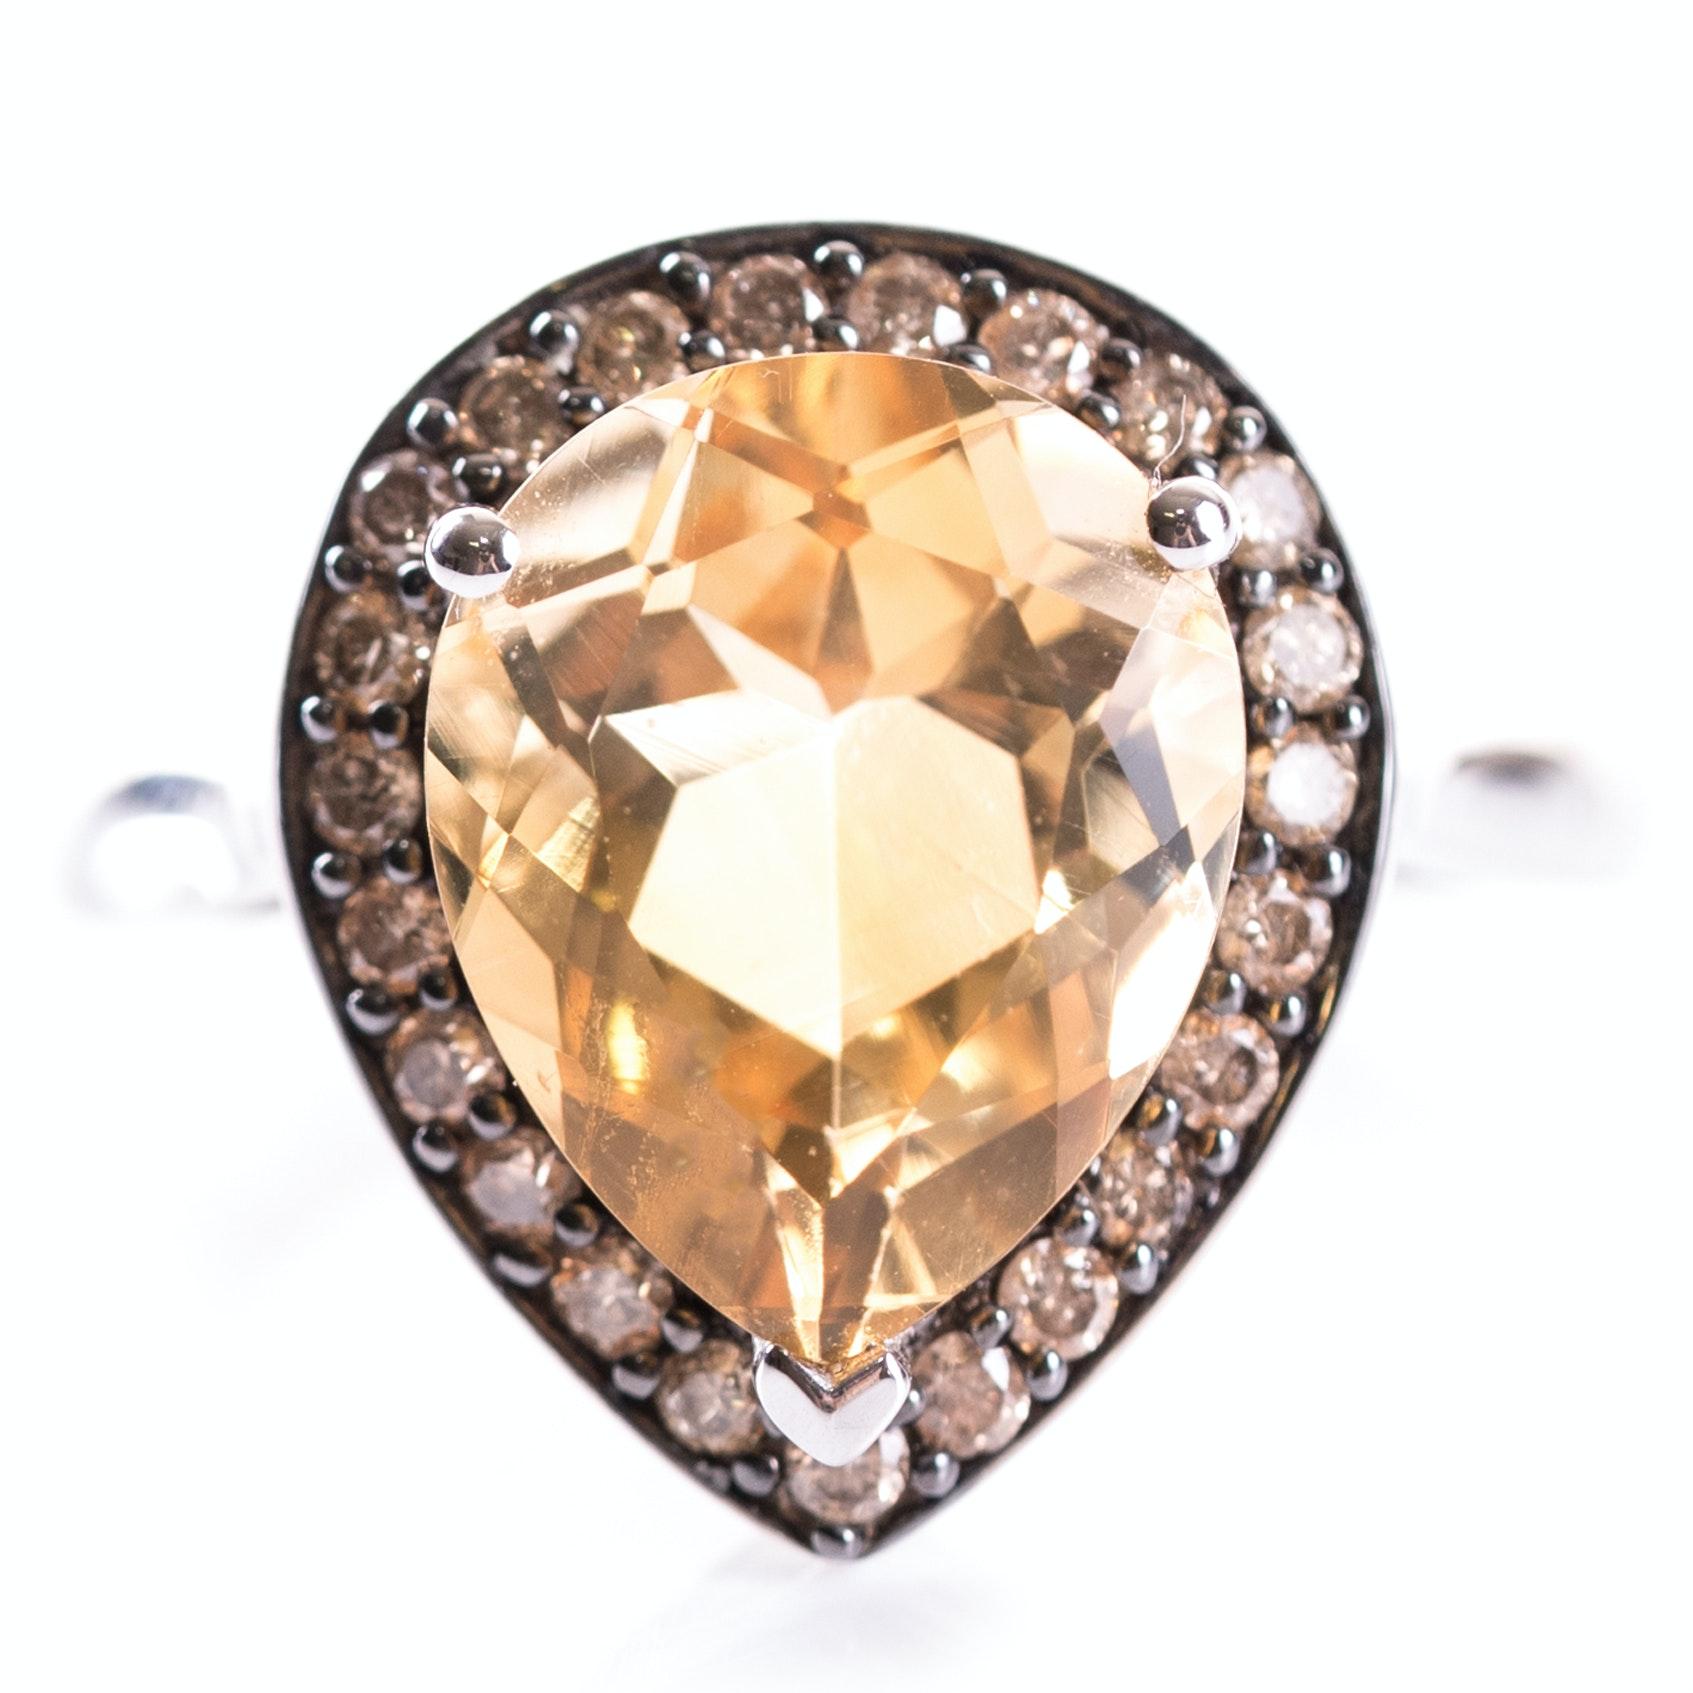 EFFY 14K White Gold, Citrine, and Diamond Ring